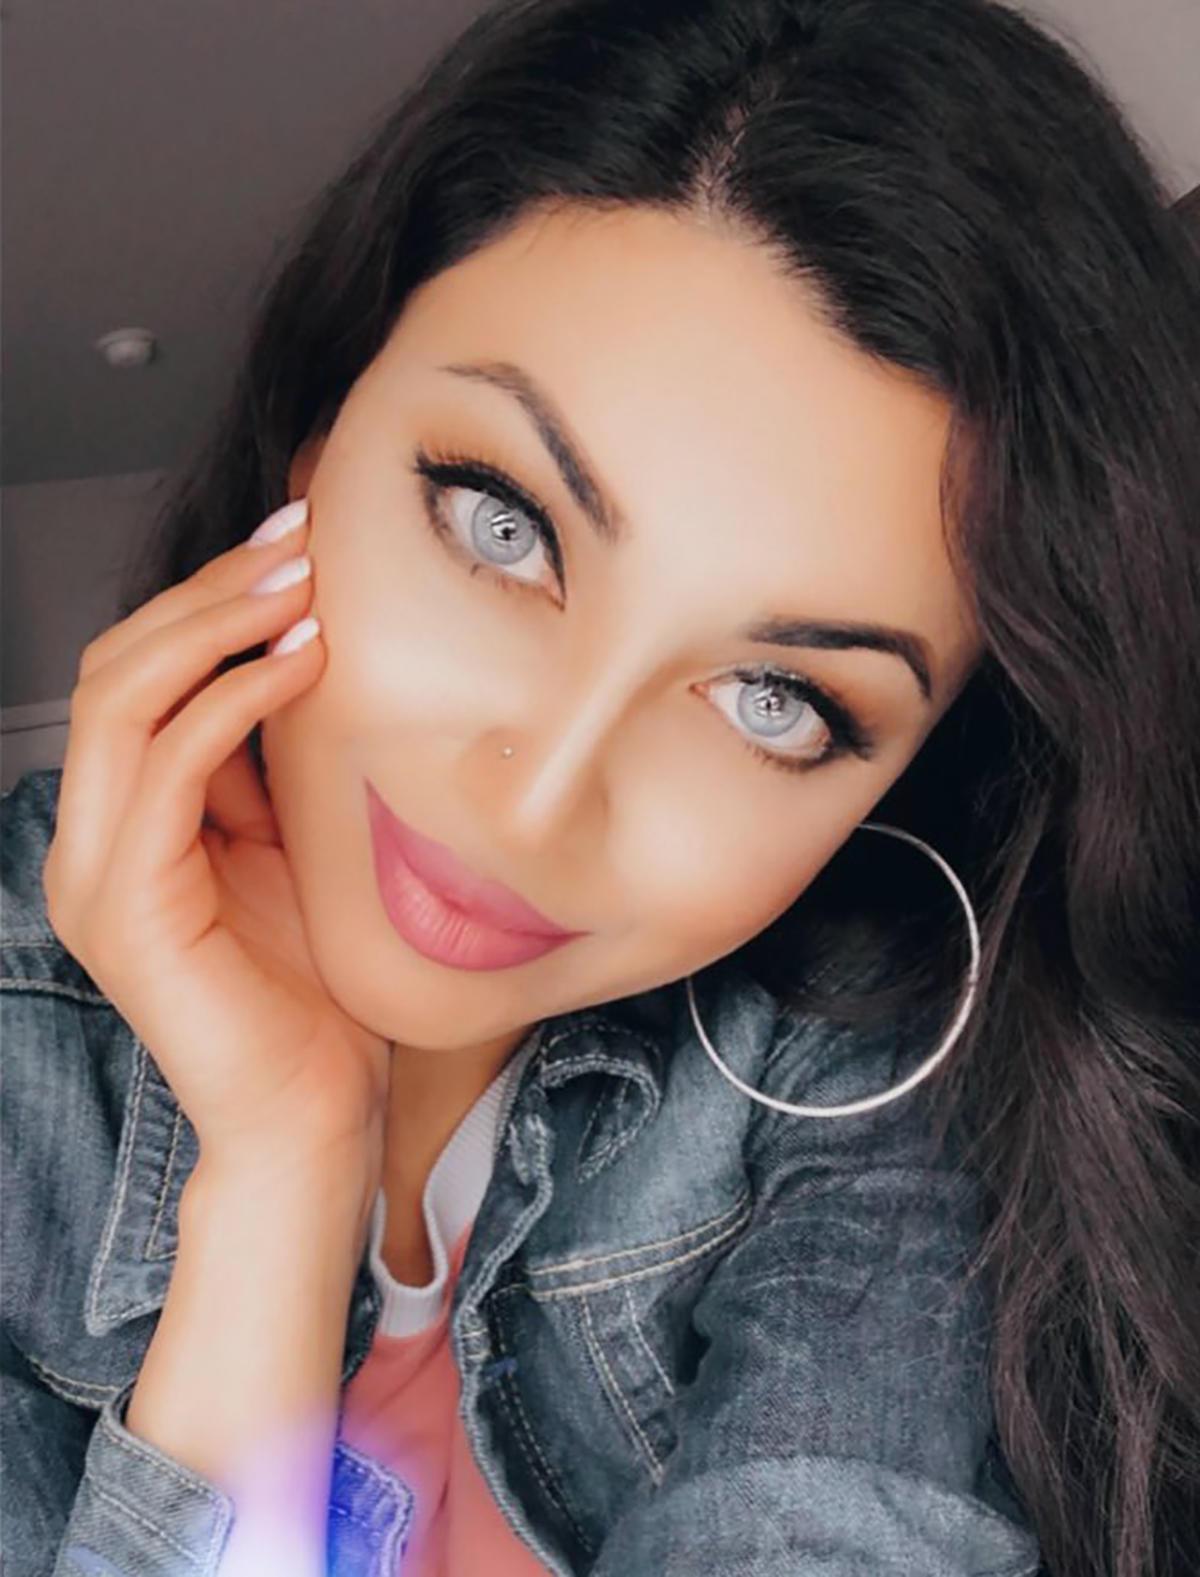 Meet Aishwarya Rai Bachchan's doppelgänger Aamna Imran from Pakistan